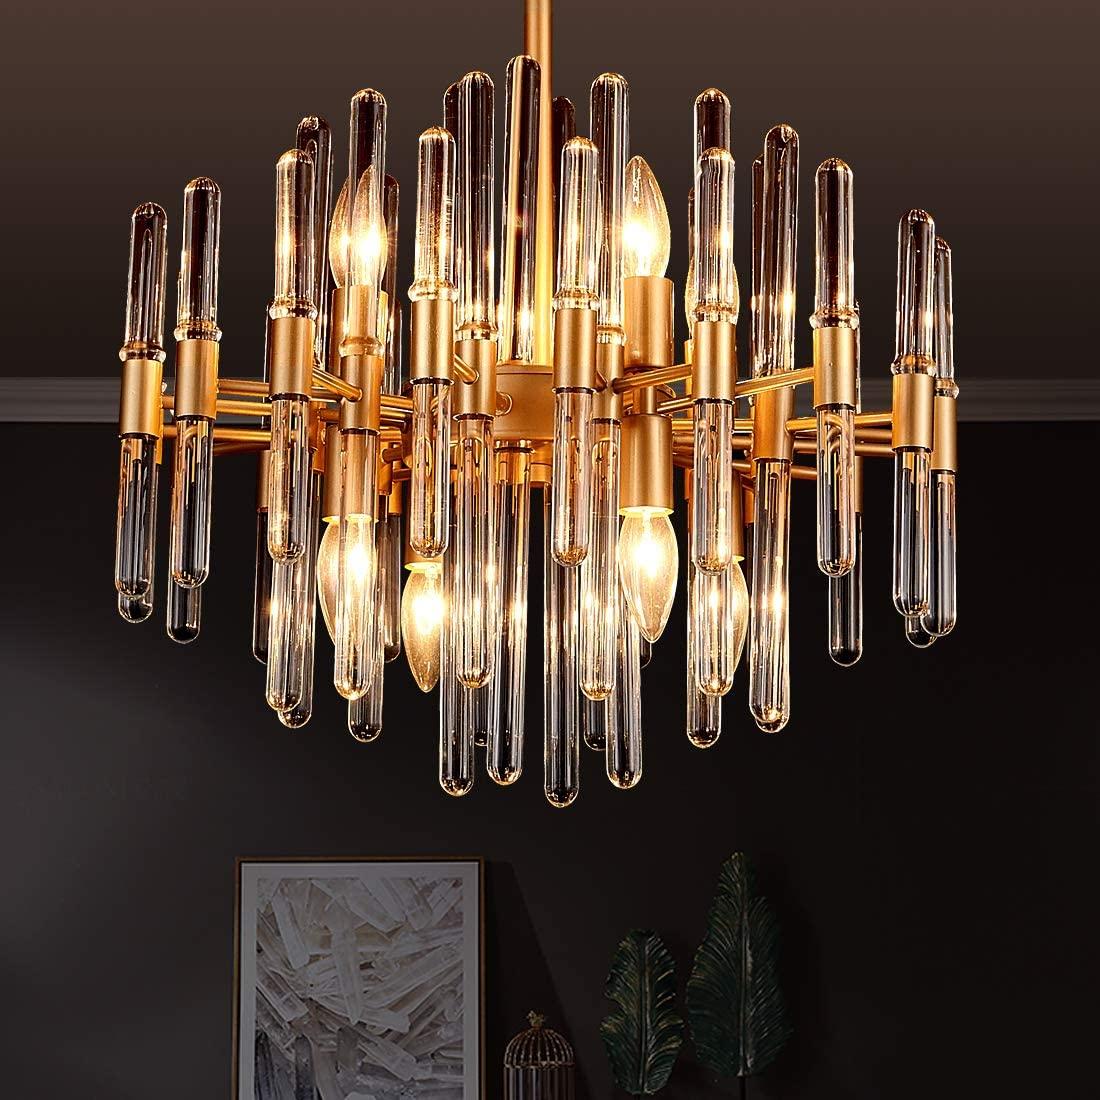 TZOE Modern Chandeliers,Crystal Chandelier,8 Light Round Pendant Light,Width 19 inch,Brass Metal + Clear Glass,Adjustable Height,UL Listed